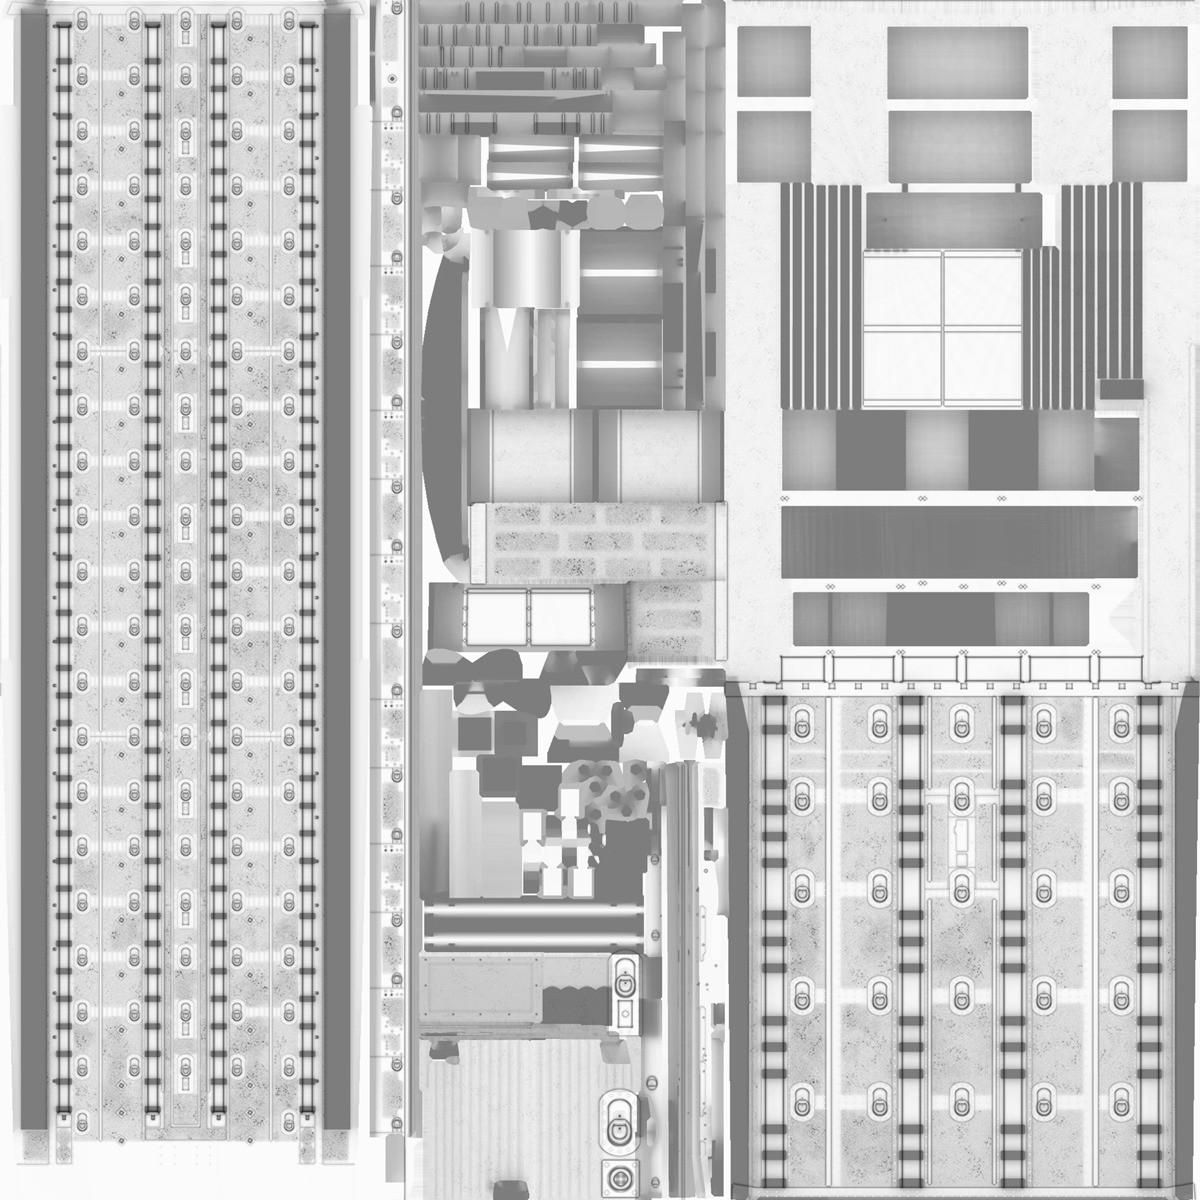 Justin wildhorn mc 130j floorcargodoors ambientocclusion 1k